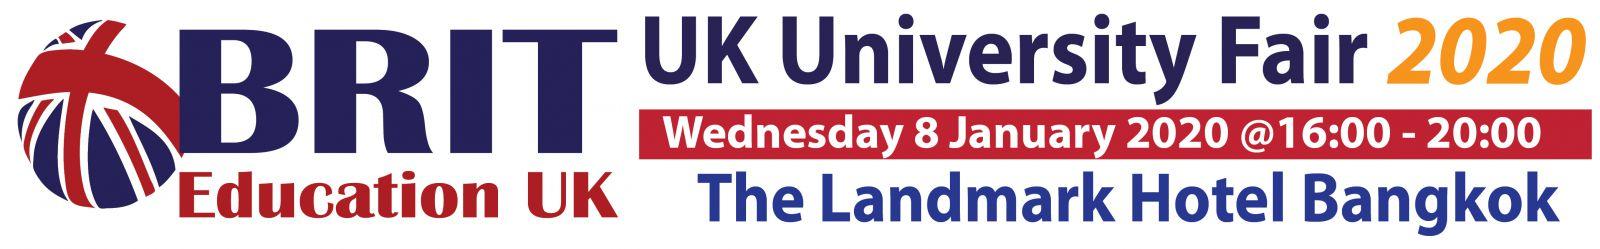 UK University Fair งานศึกษาต่ออังกฤษใหญ่ที่สุด Wed 8 January 2020: 16.00-20.00 – BRIT